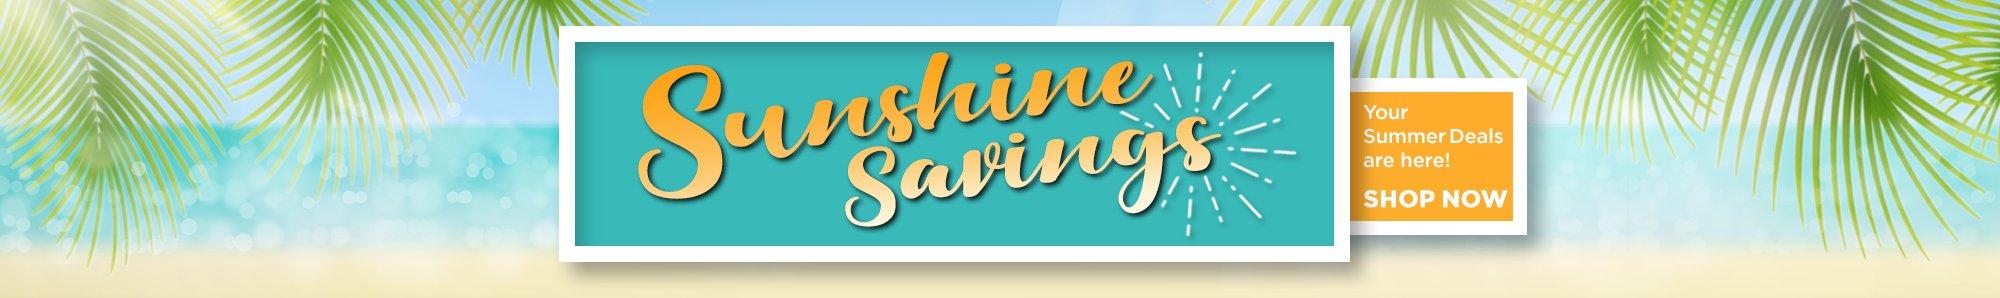 We've got your Sunshine Savings - get great deals all month long! Shop now!